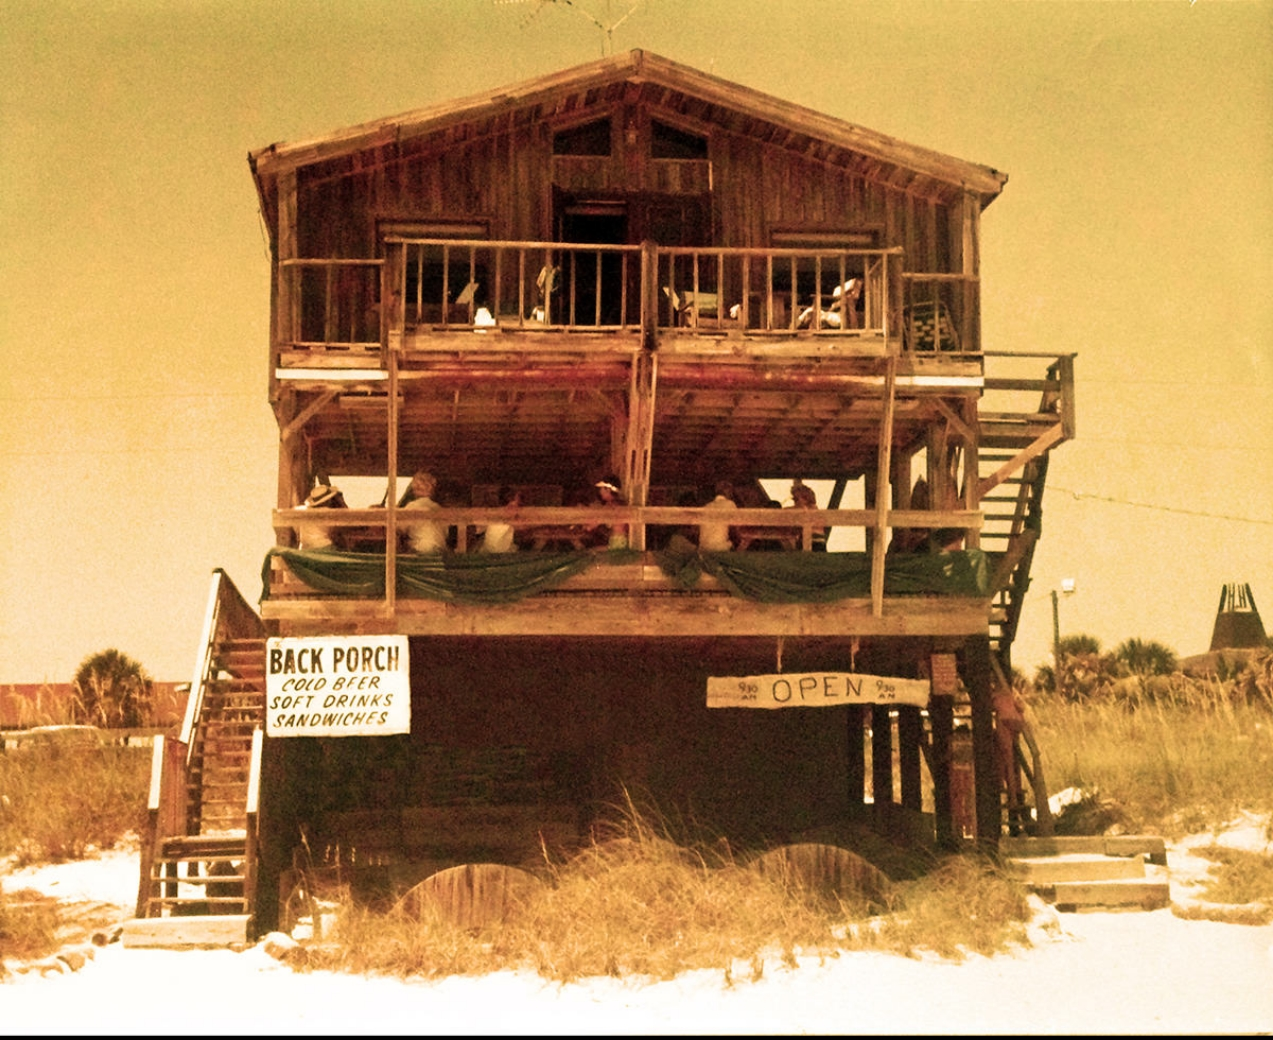 The Back Porch in Destin, circa 1974